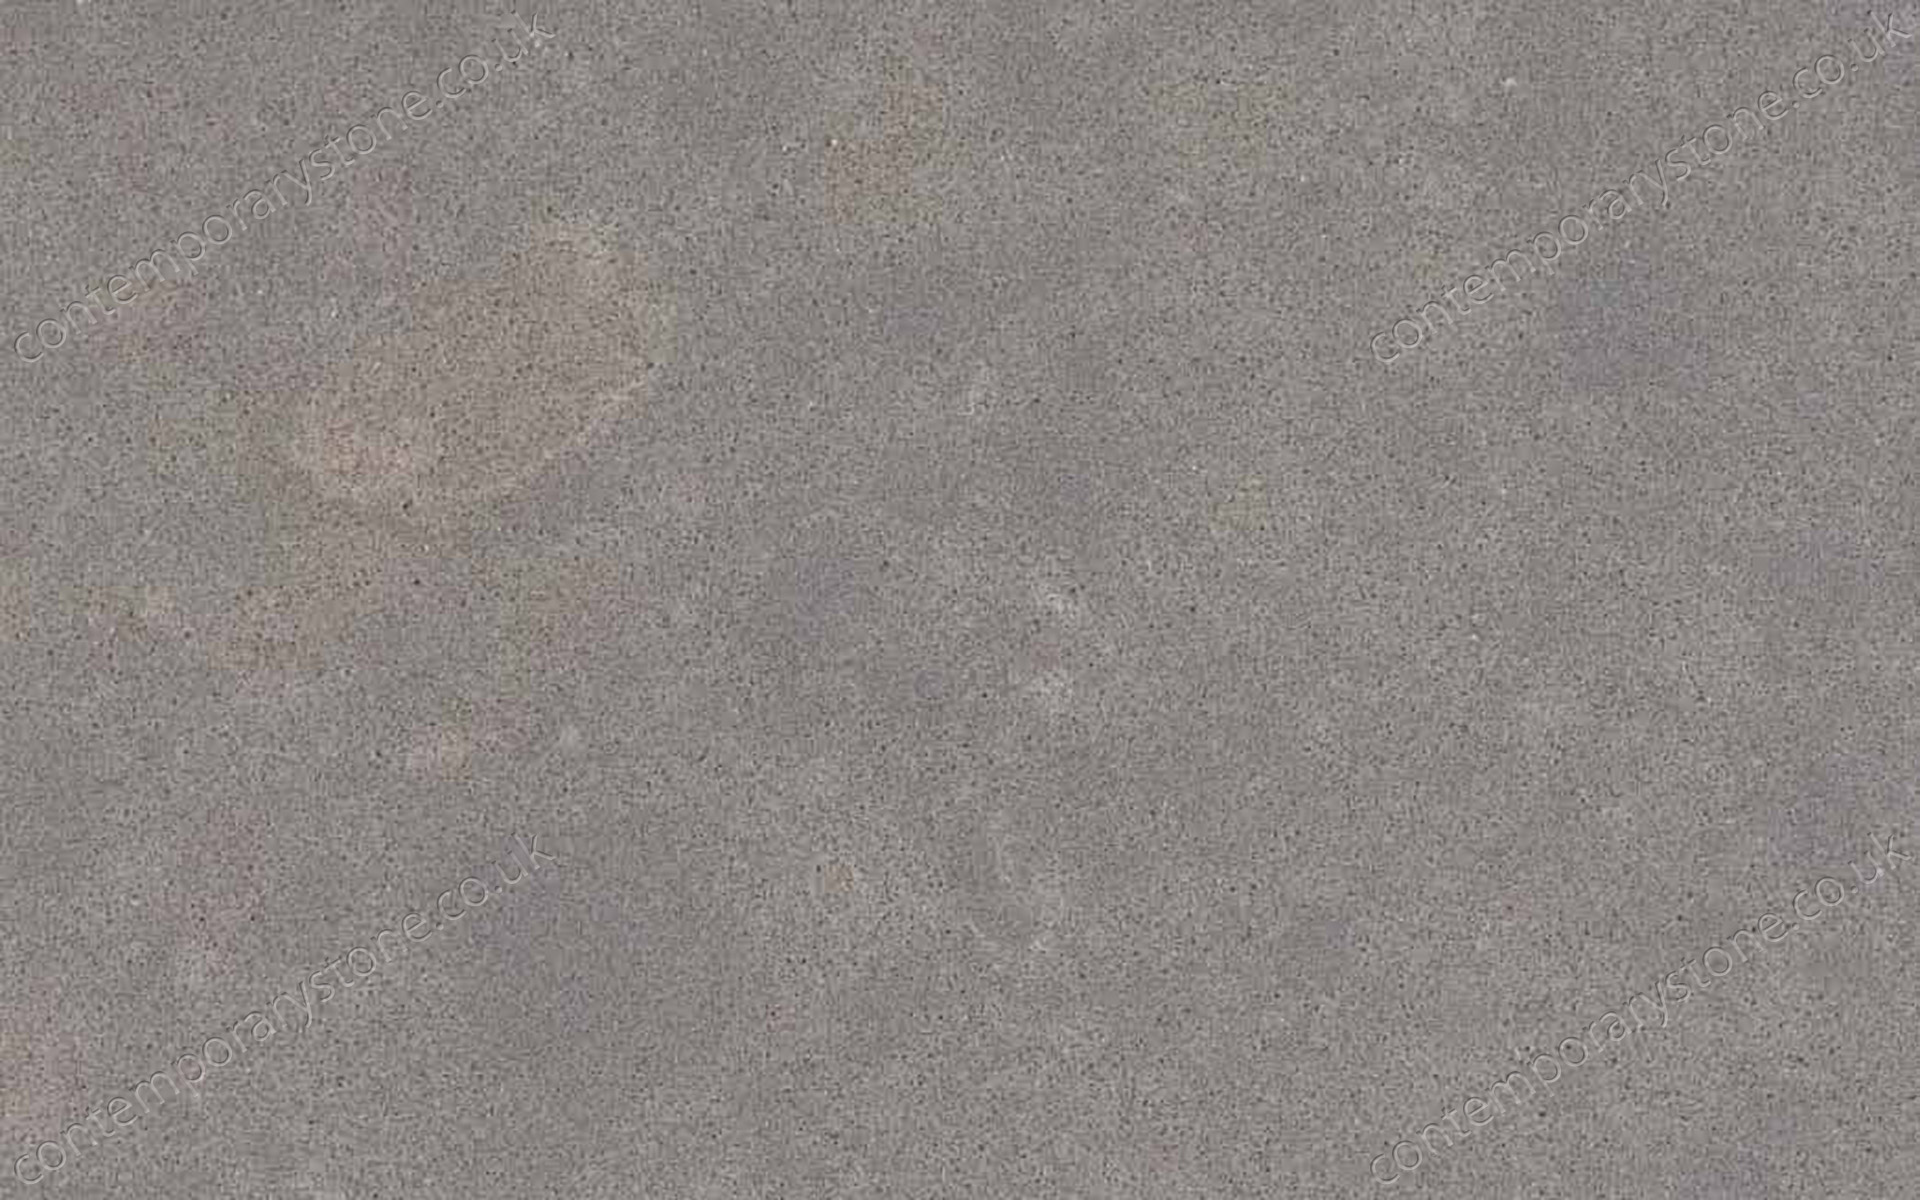 Lagos Blue limestone close-up